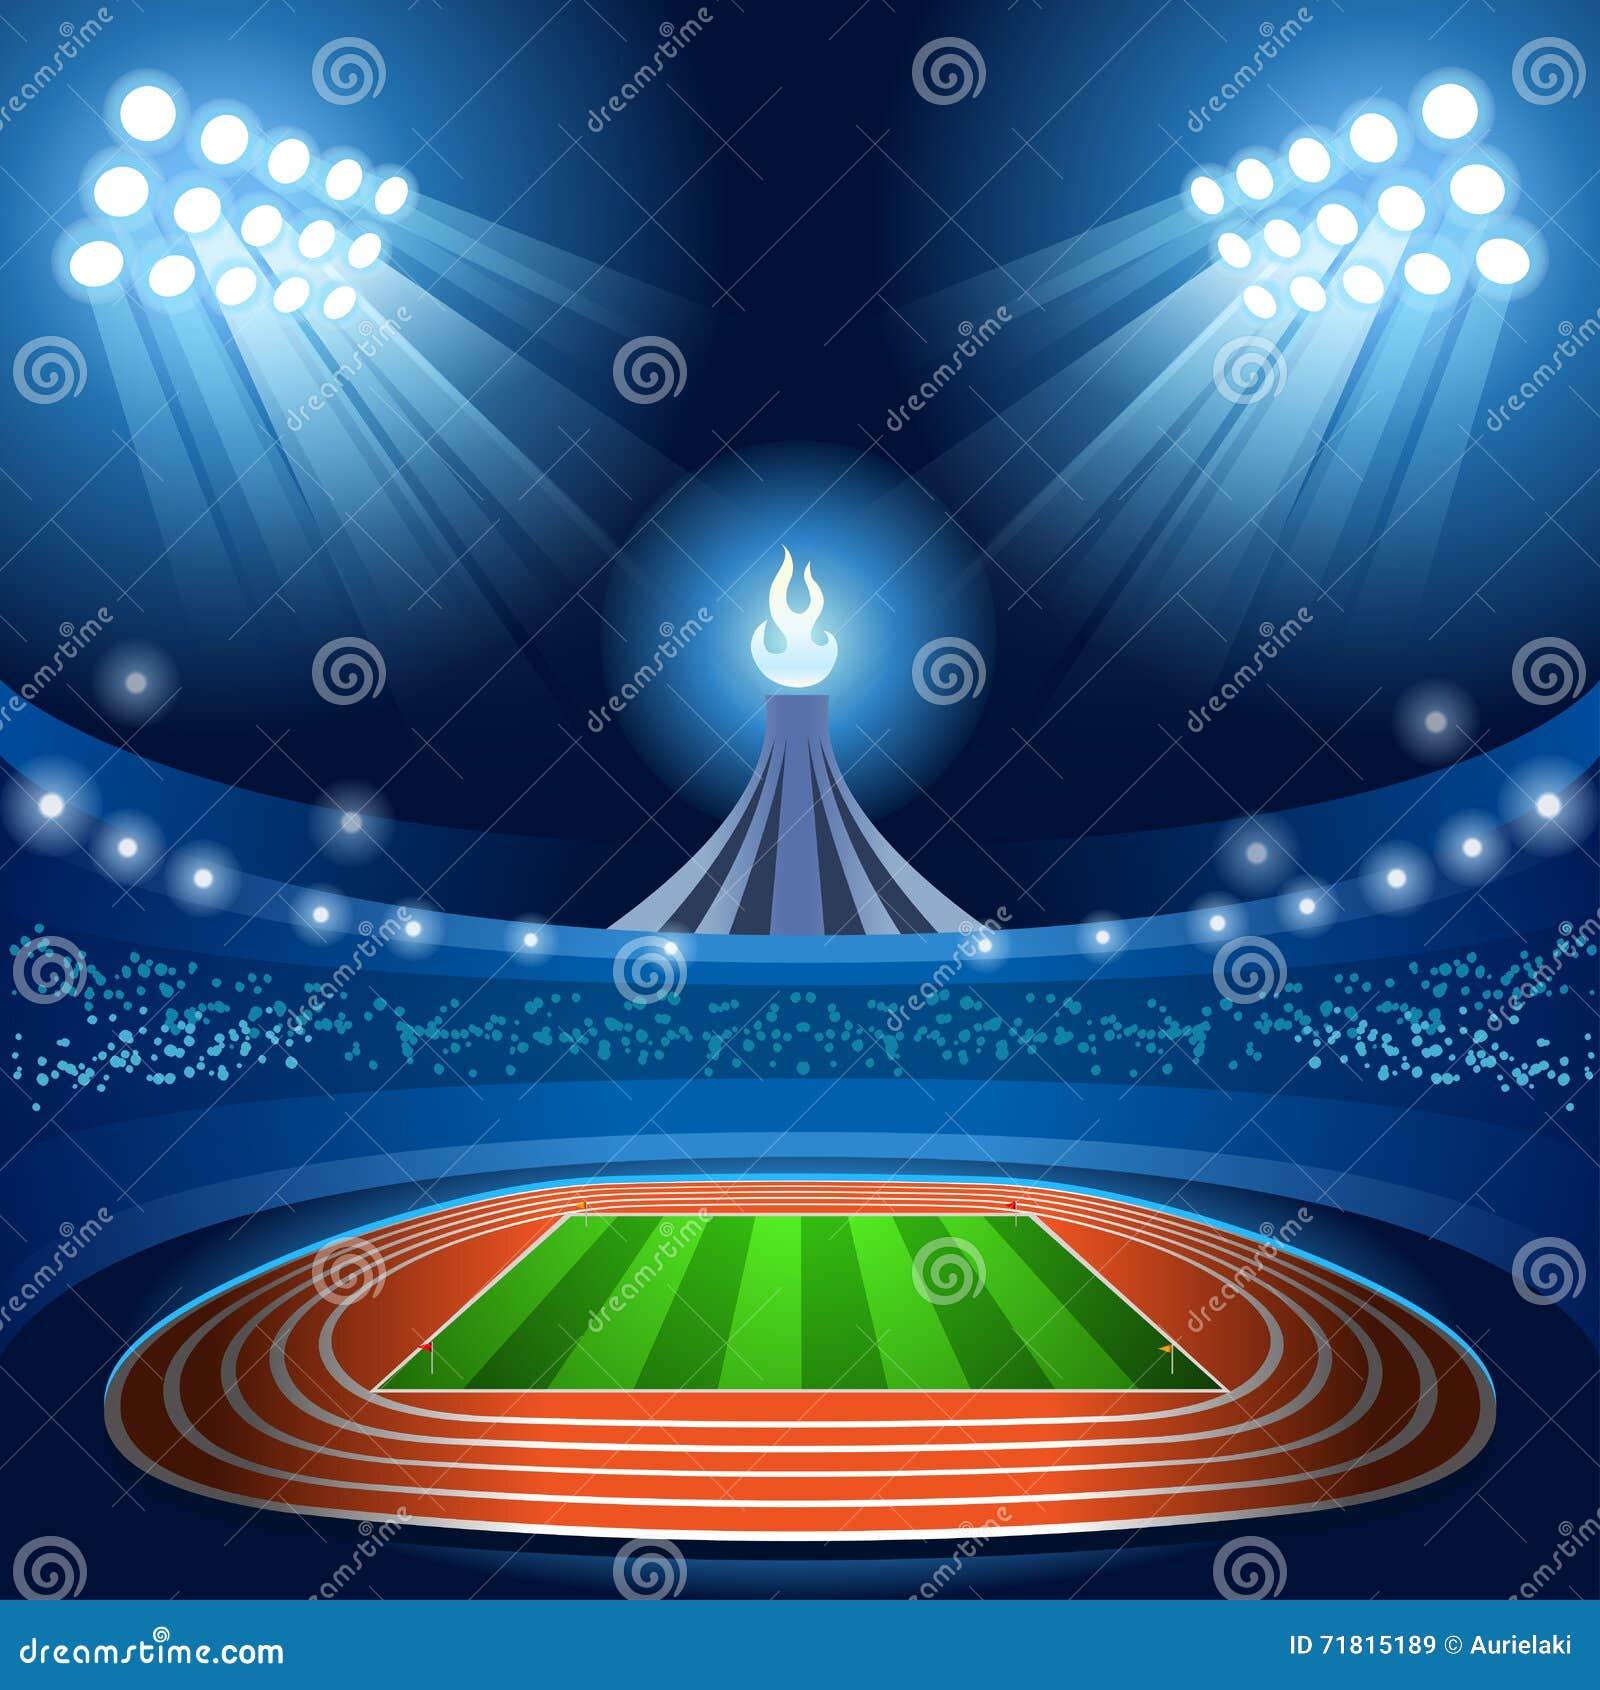 Stadium Background Olympic Rhythmic Gymnastics Female Athlete with Ribbon Equipment Gymnast on Field Background